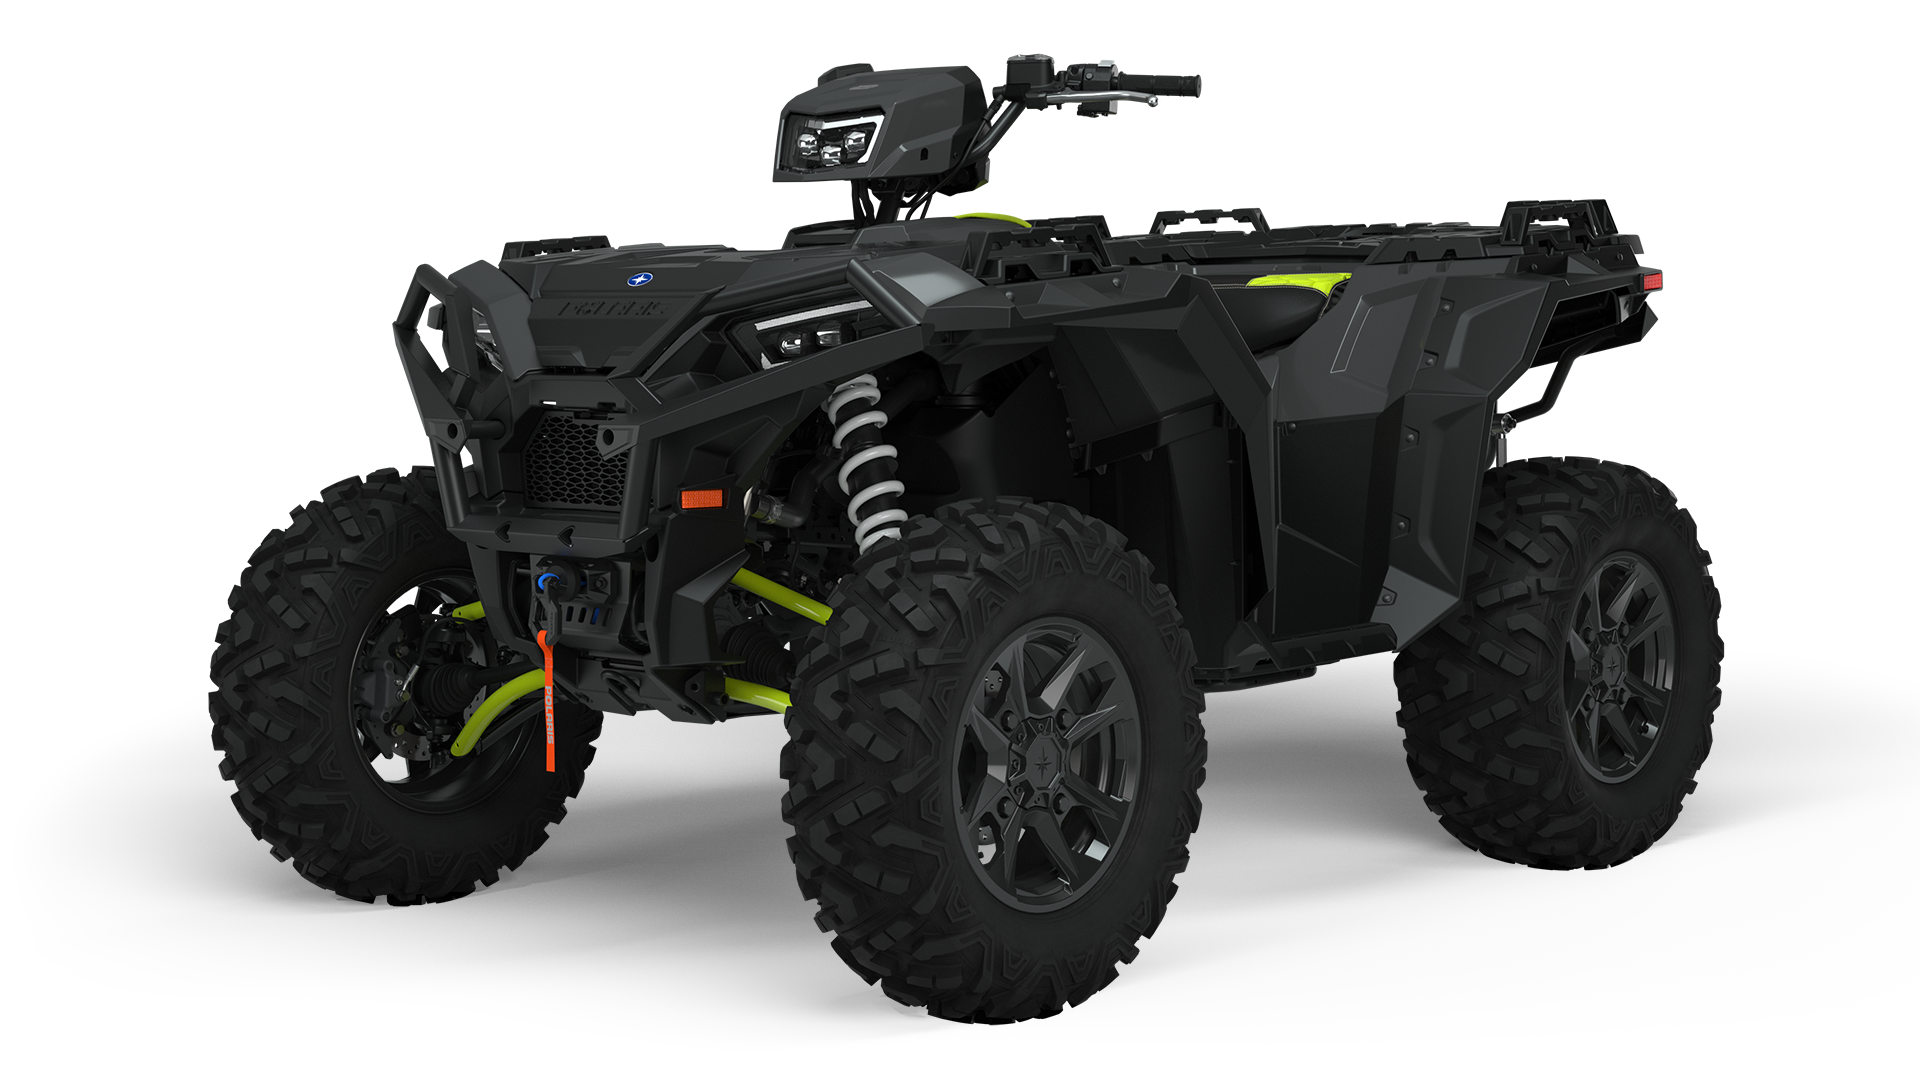 ATV Polaris Sportsman XP 1000 S 2022